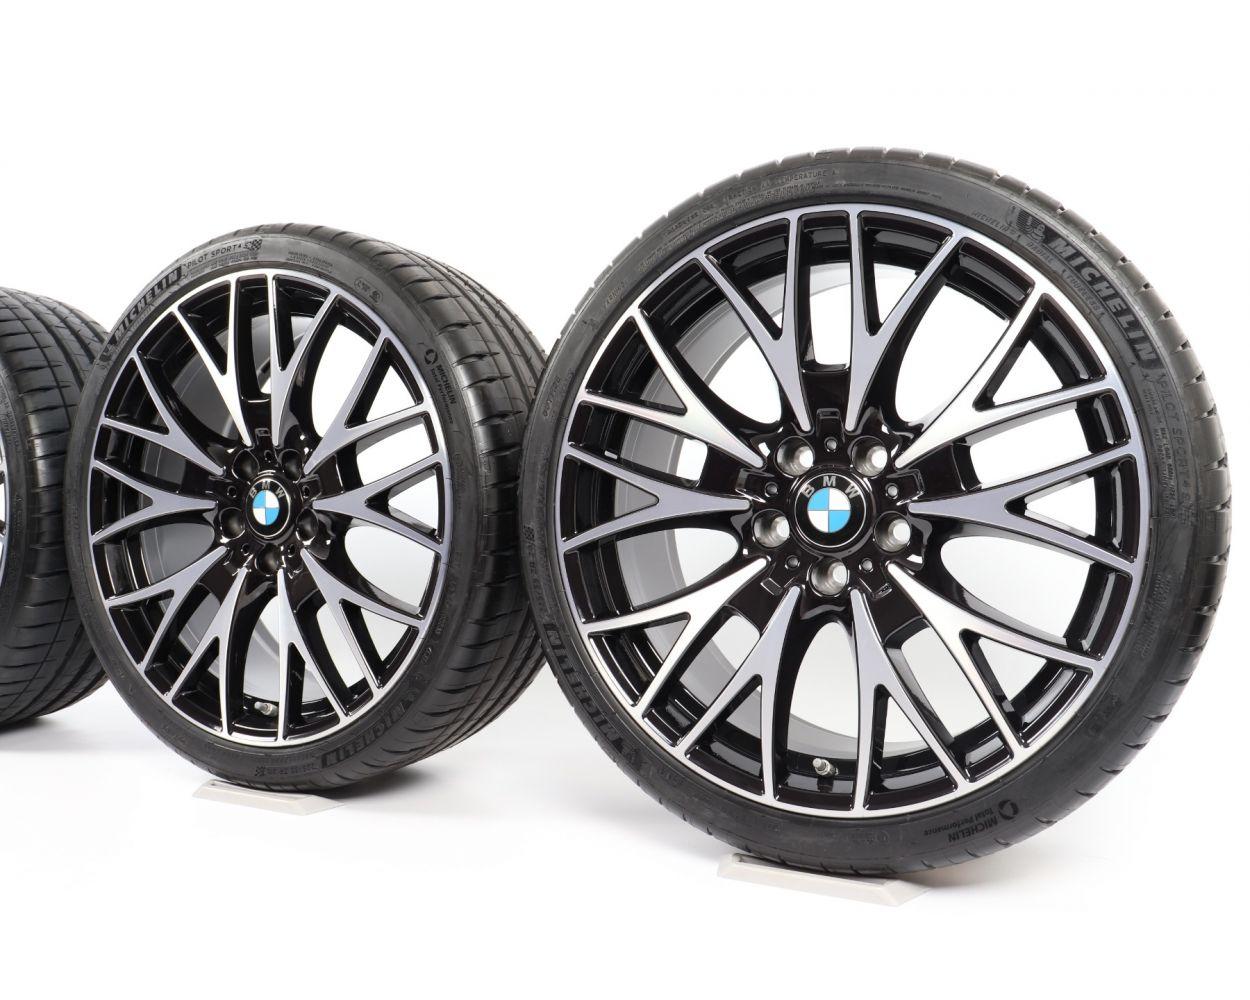 Bmw Summer Wheels 3er F30 F31 4er F32 F33 F36 20 Zoll 624 M Double Spoke Rdc Bicolor